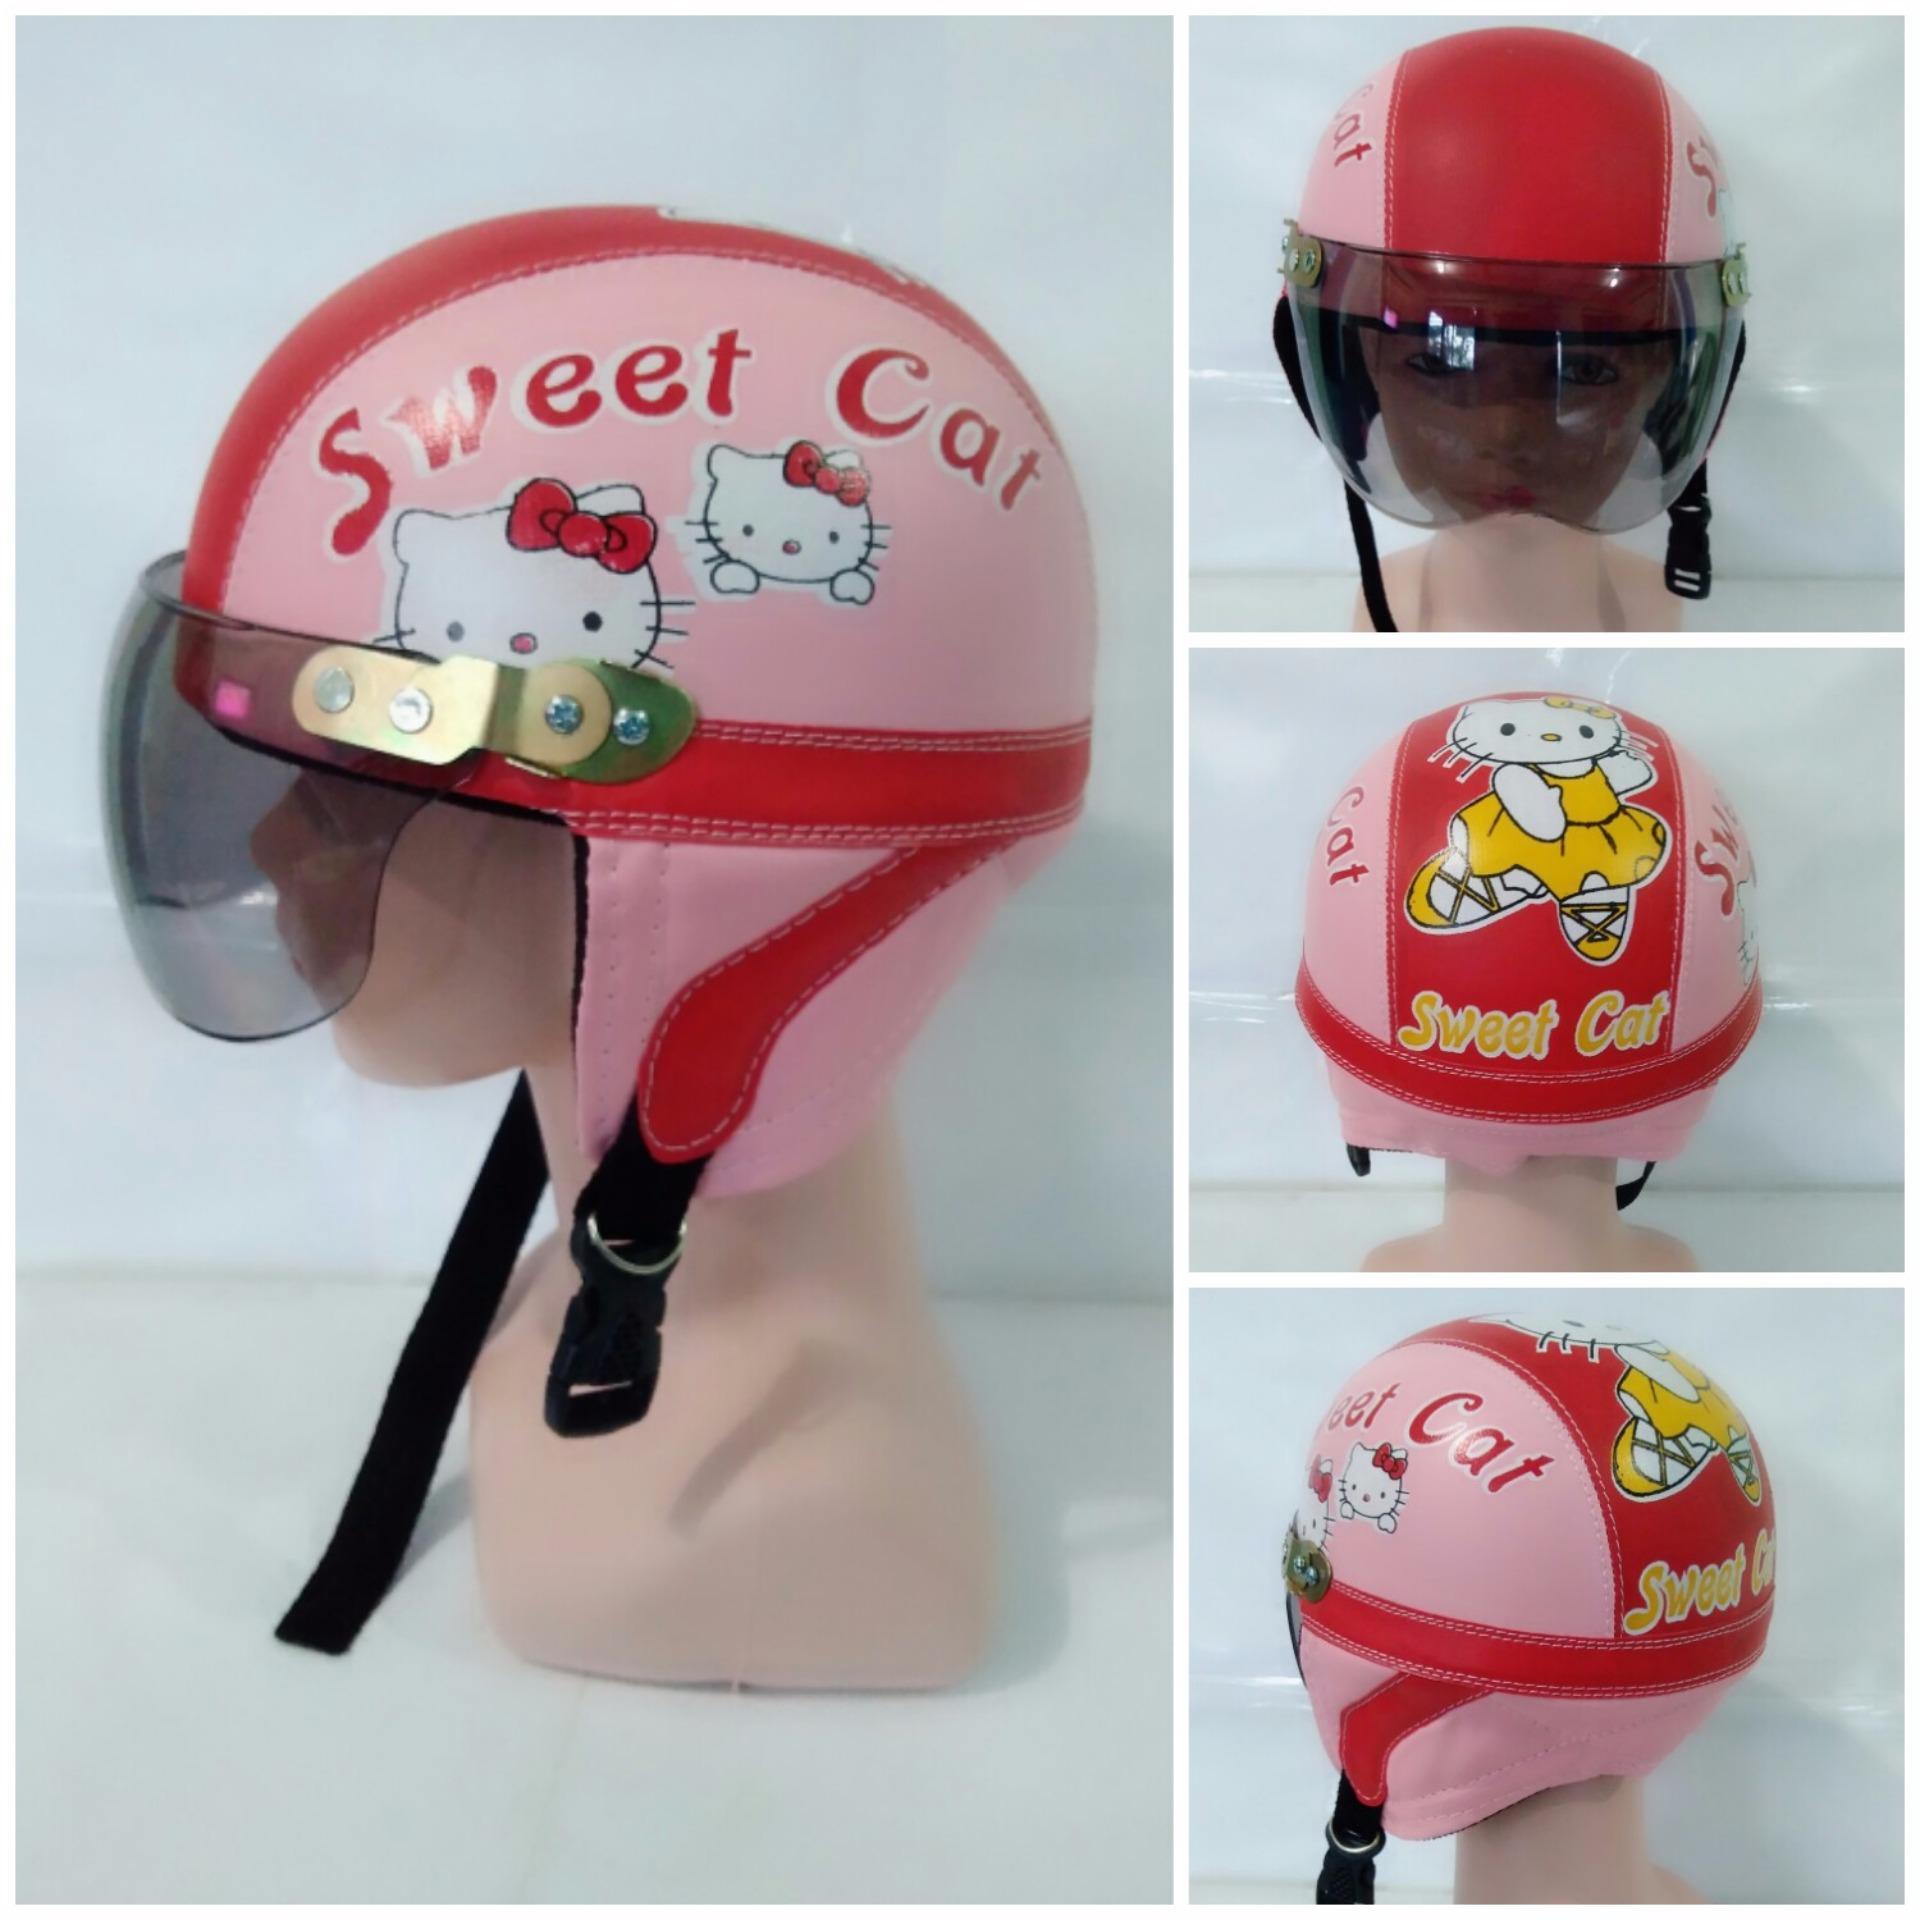 Cek Harga Baru Helm Anak Retro Standar Karakter Robot Mobil Terkini Frozen Helo Kitty 1 4 Thn Pink Merah